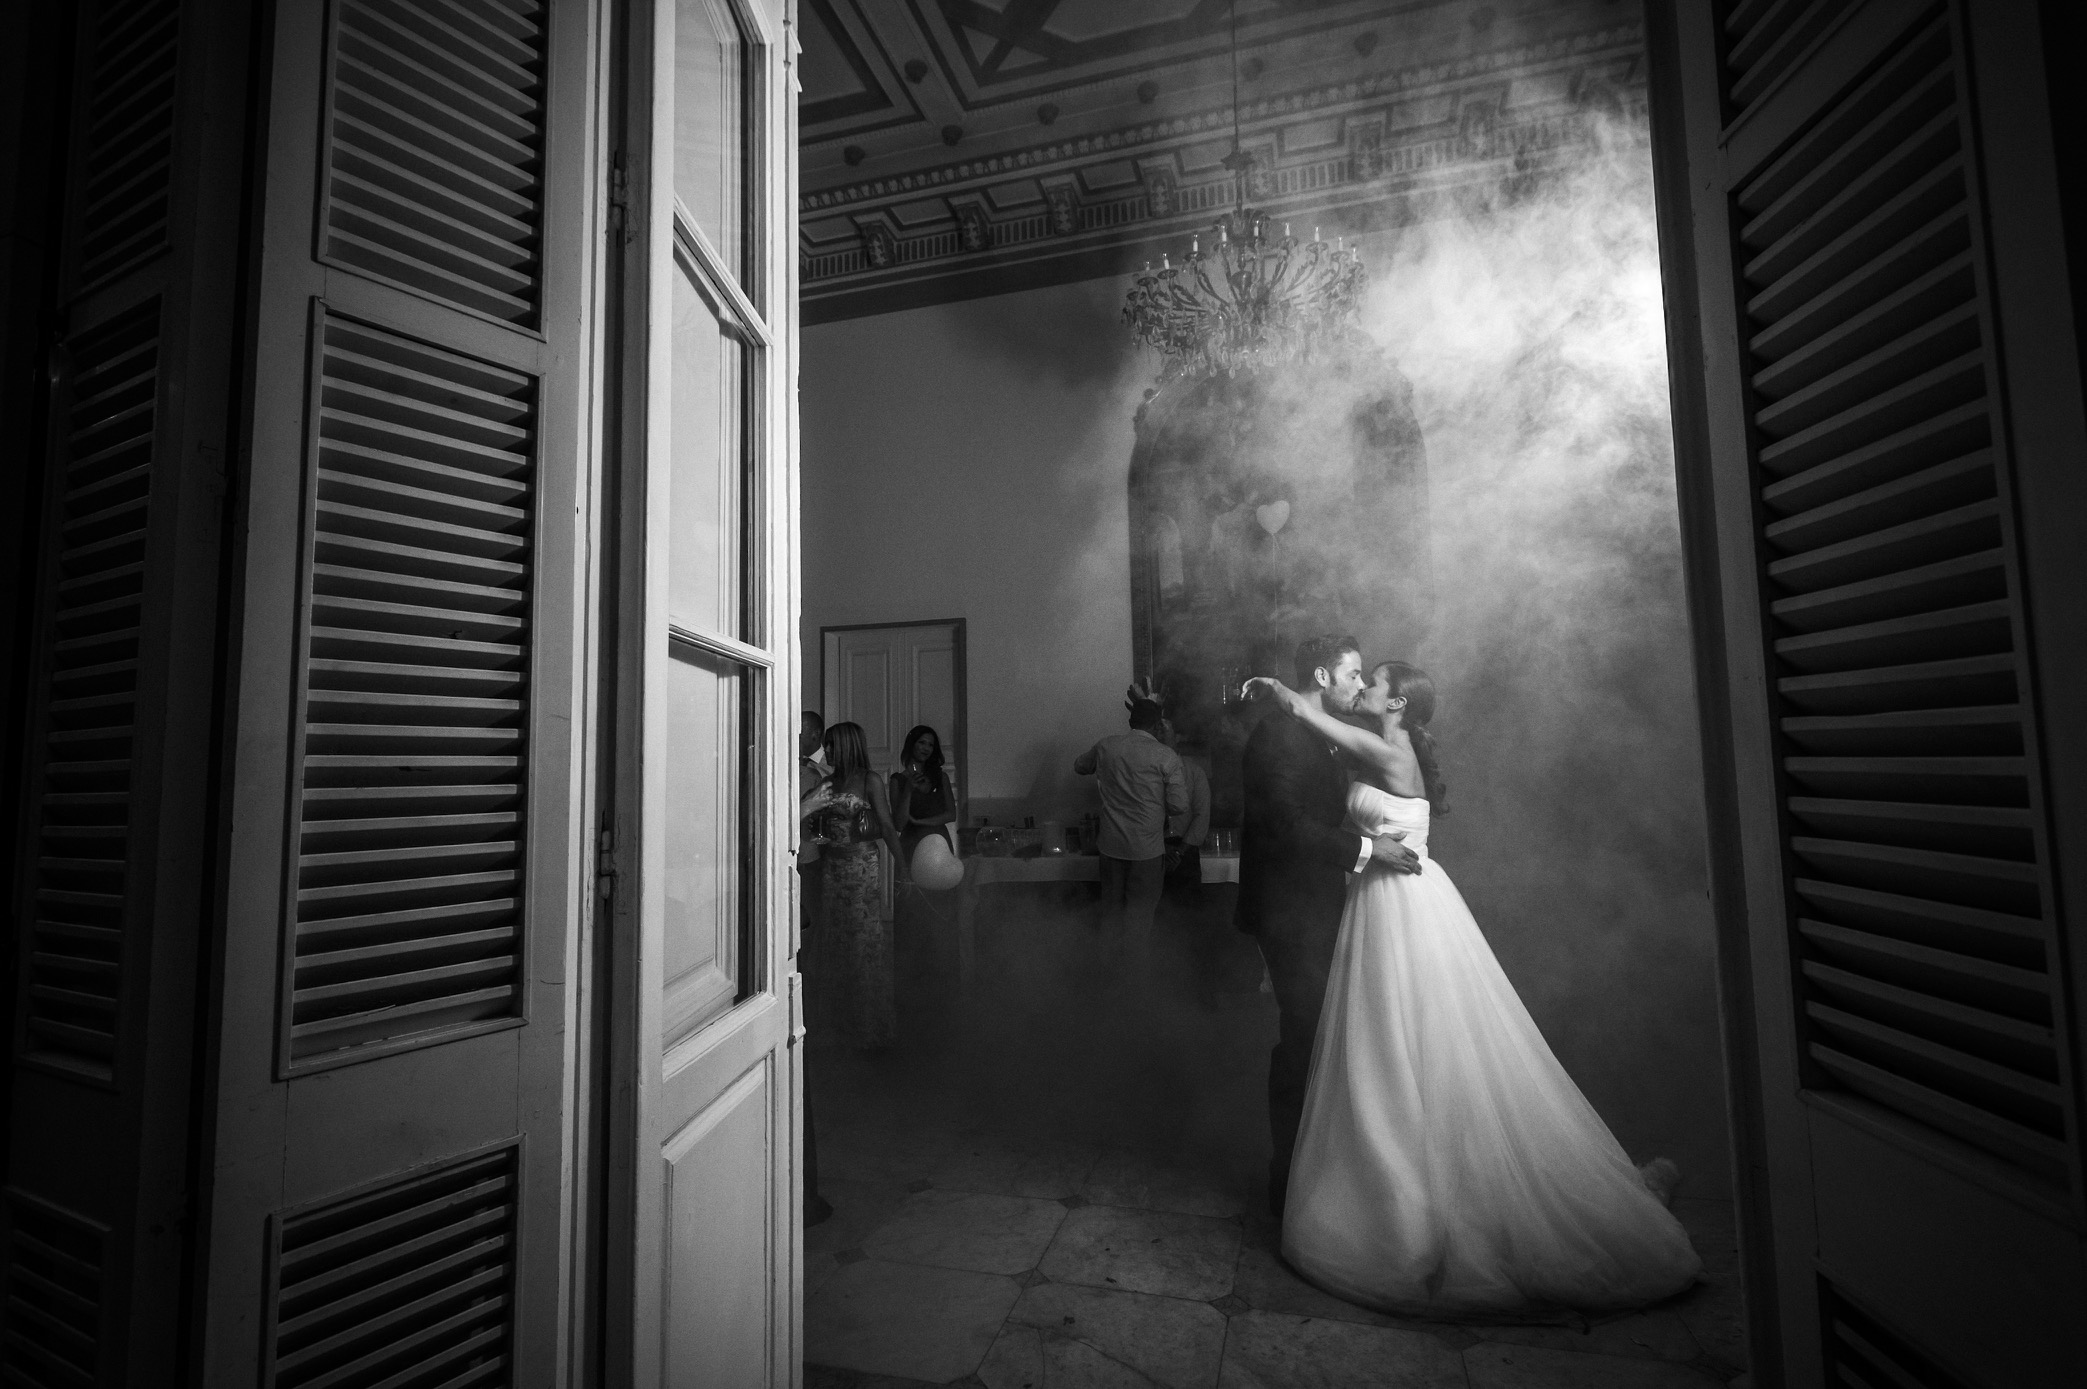 Si-Quiero-Wedding-Planner-By-Sira-Antequera-Bodas-Málaga-Marbella-Miami- Virginia-josex-1